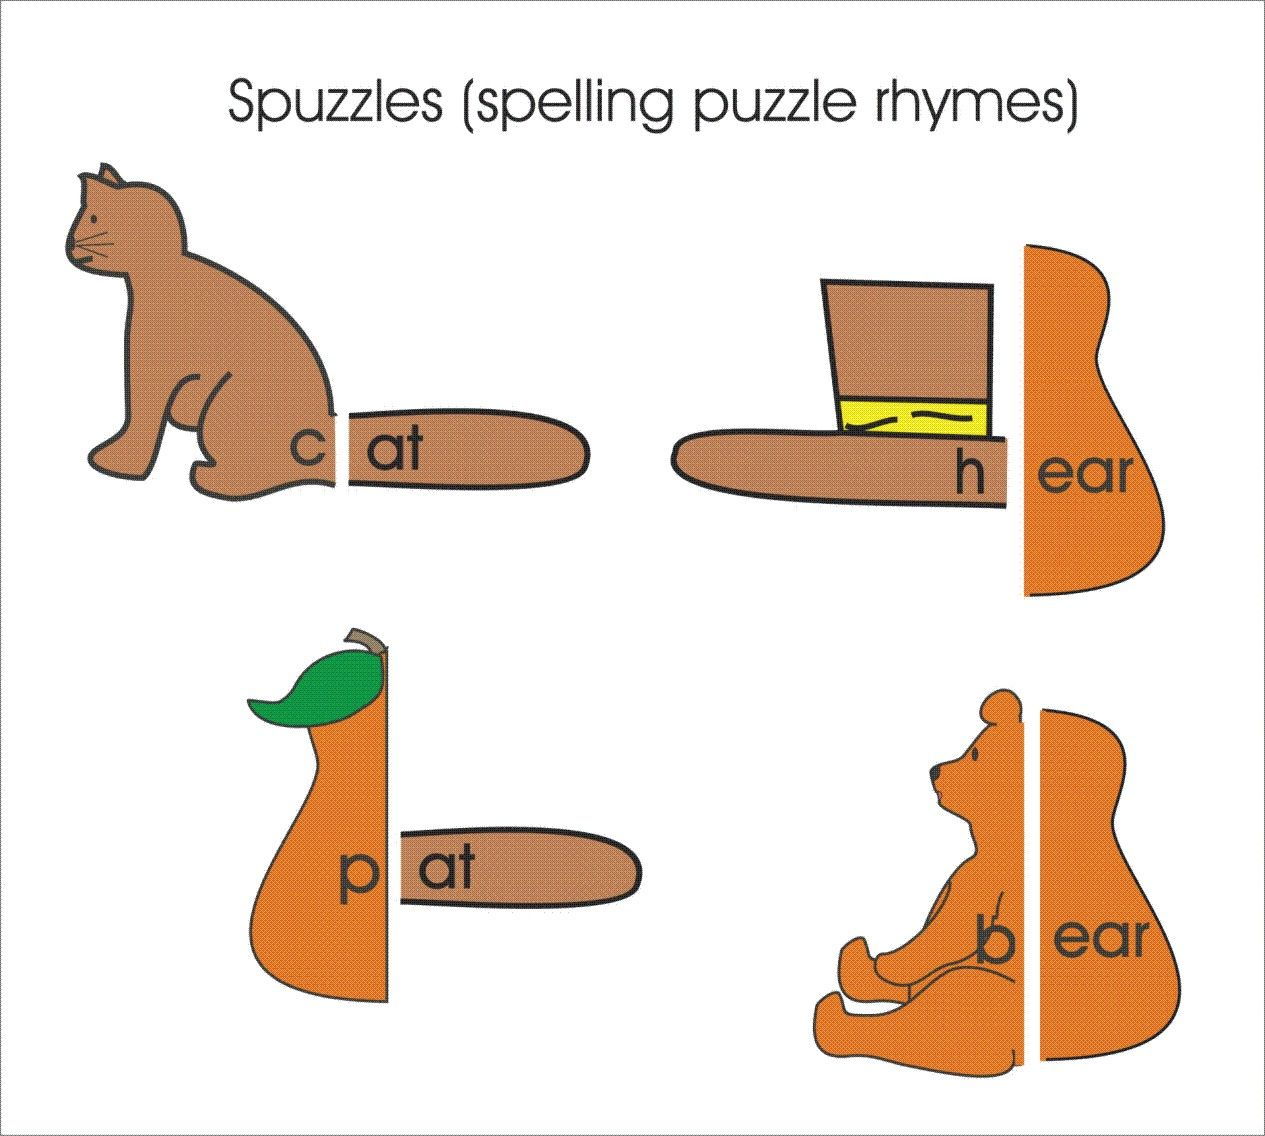 Spuzzles